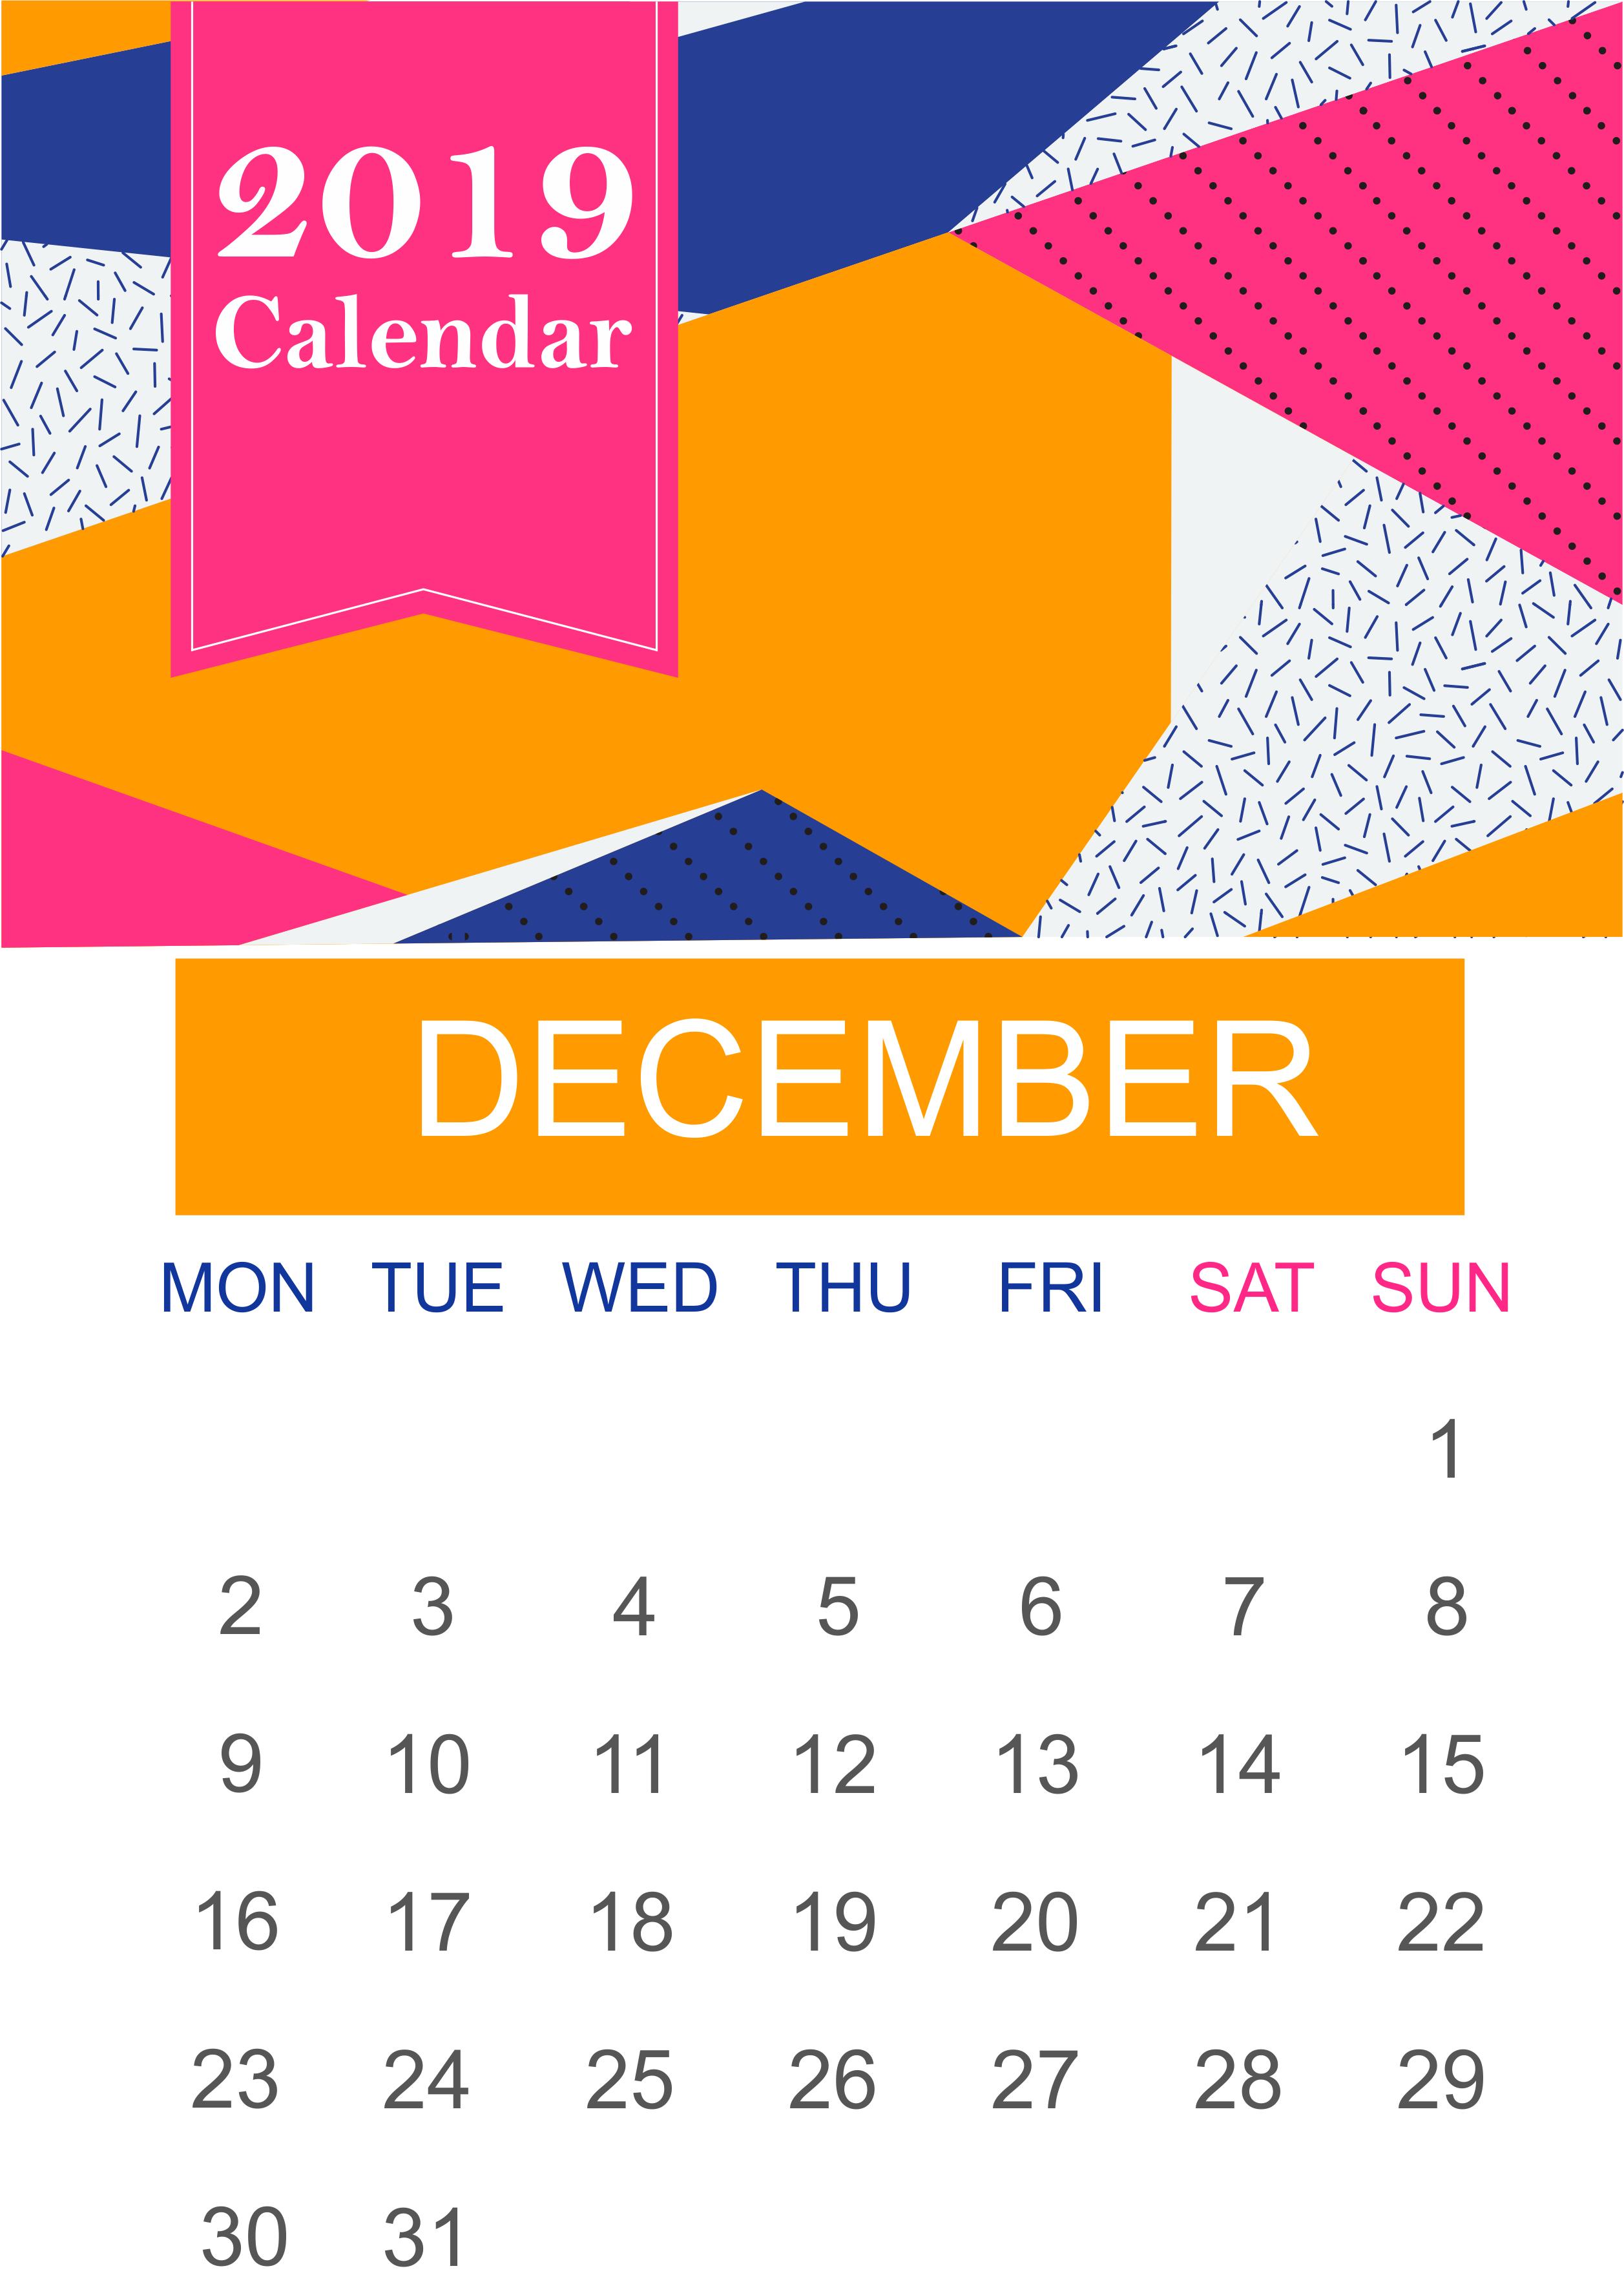 December 2019 Wall Calendar Printable